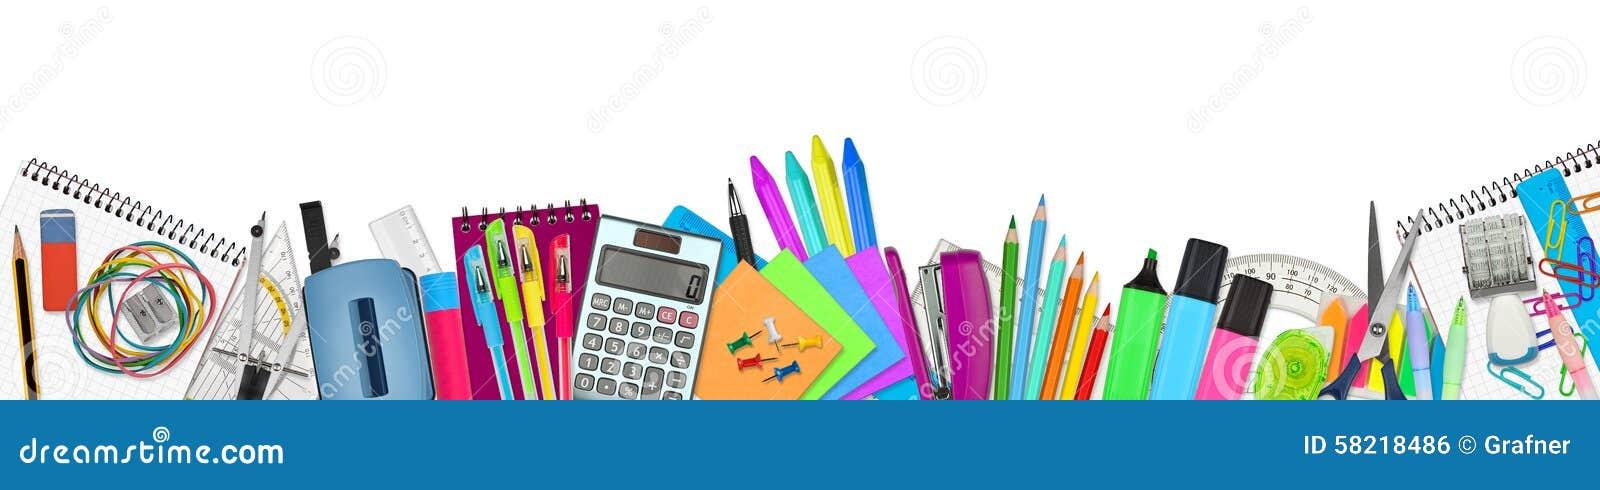 School / office supplies